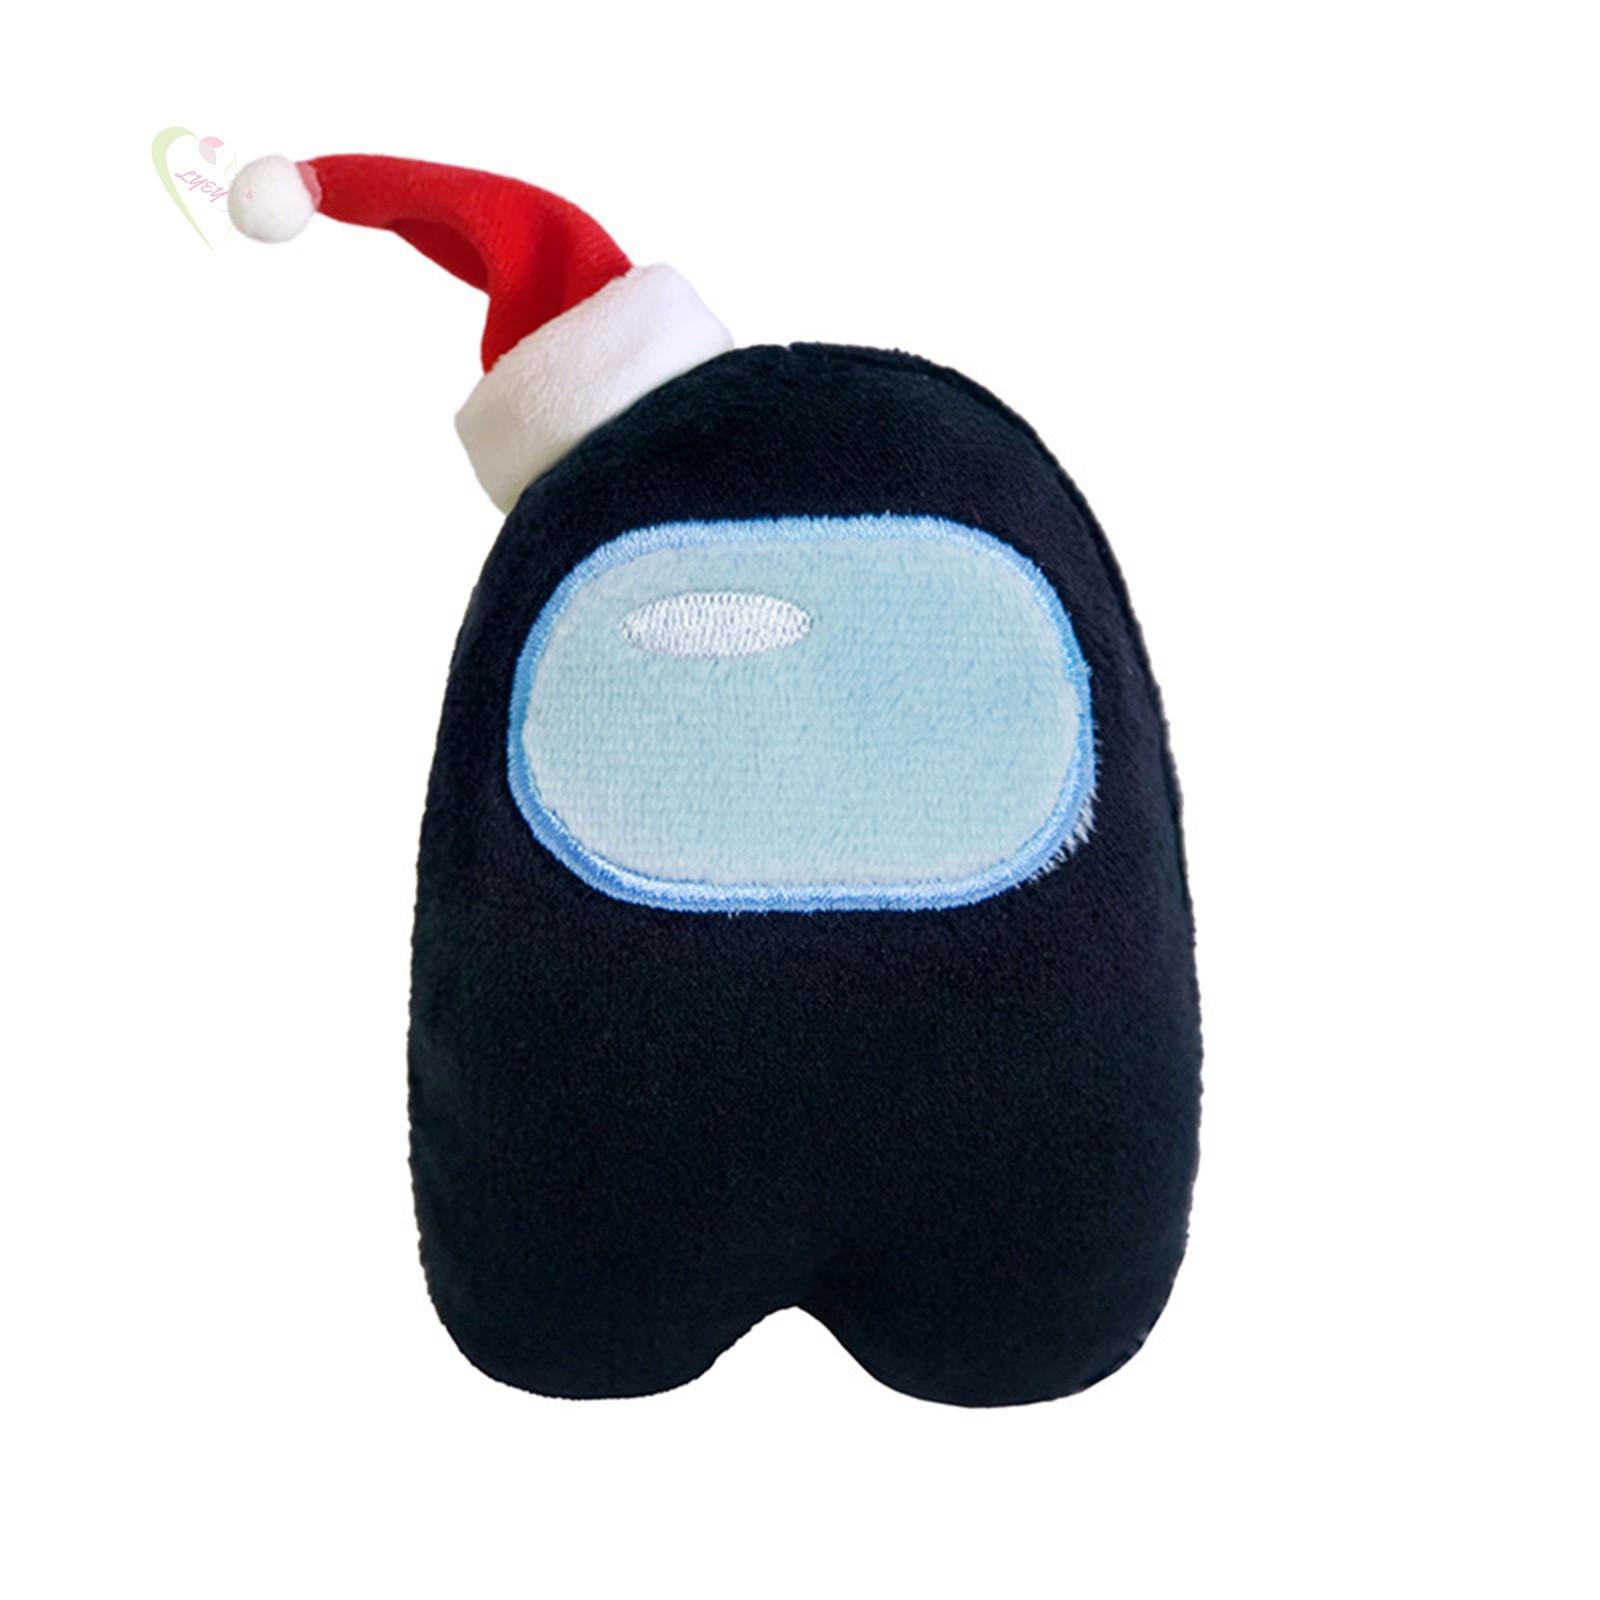 LE Xmas Hat Figure Among Us Plush Crewmate Plushie Kawaii Stuffed Soft Game Plush Toy Lovely Stuffed Doll Christmas Gift...